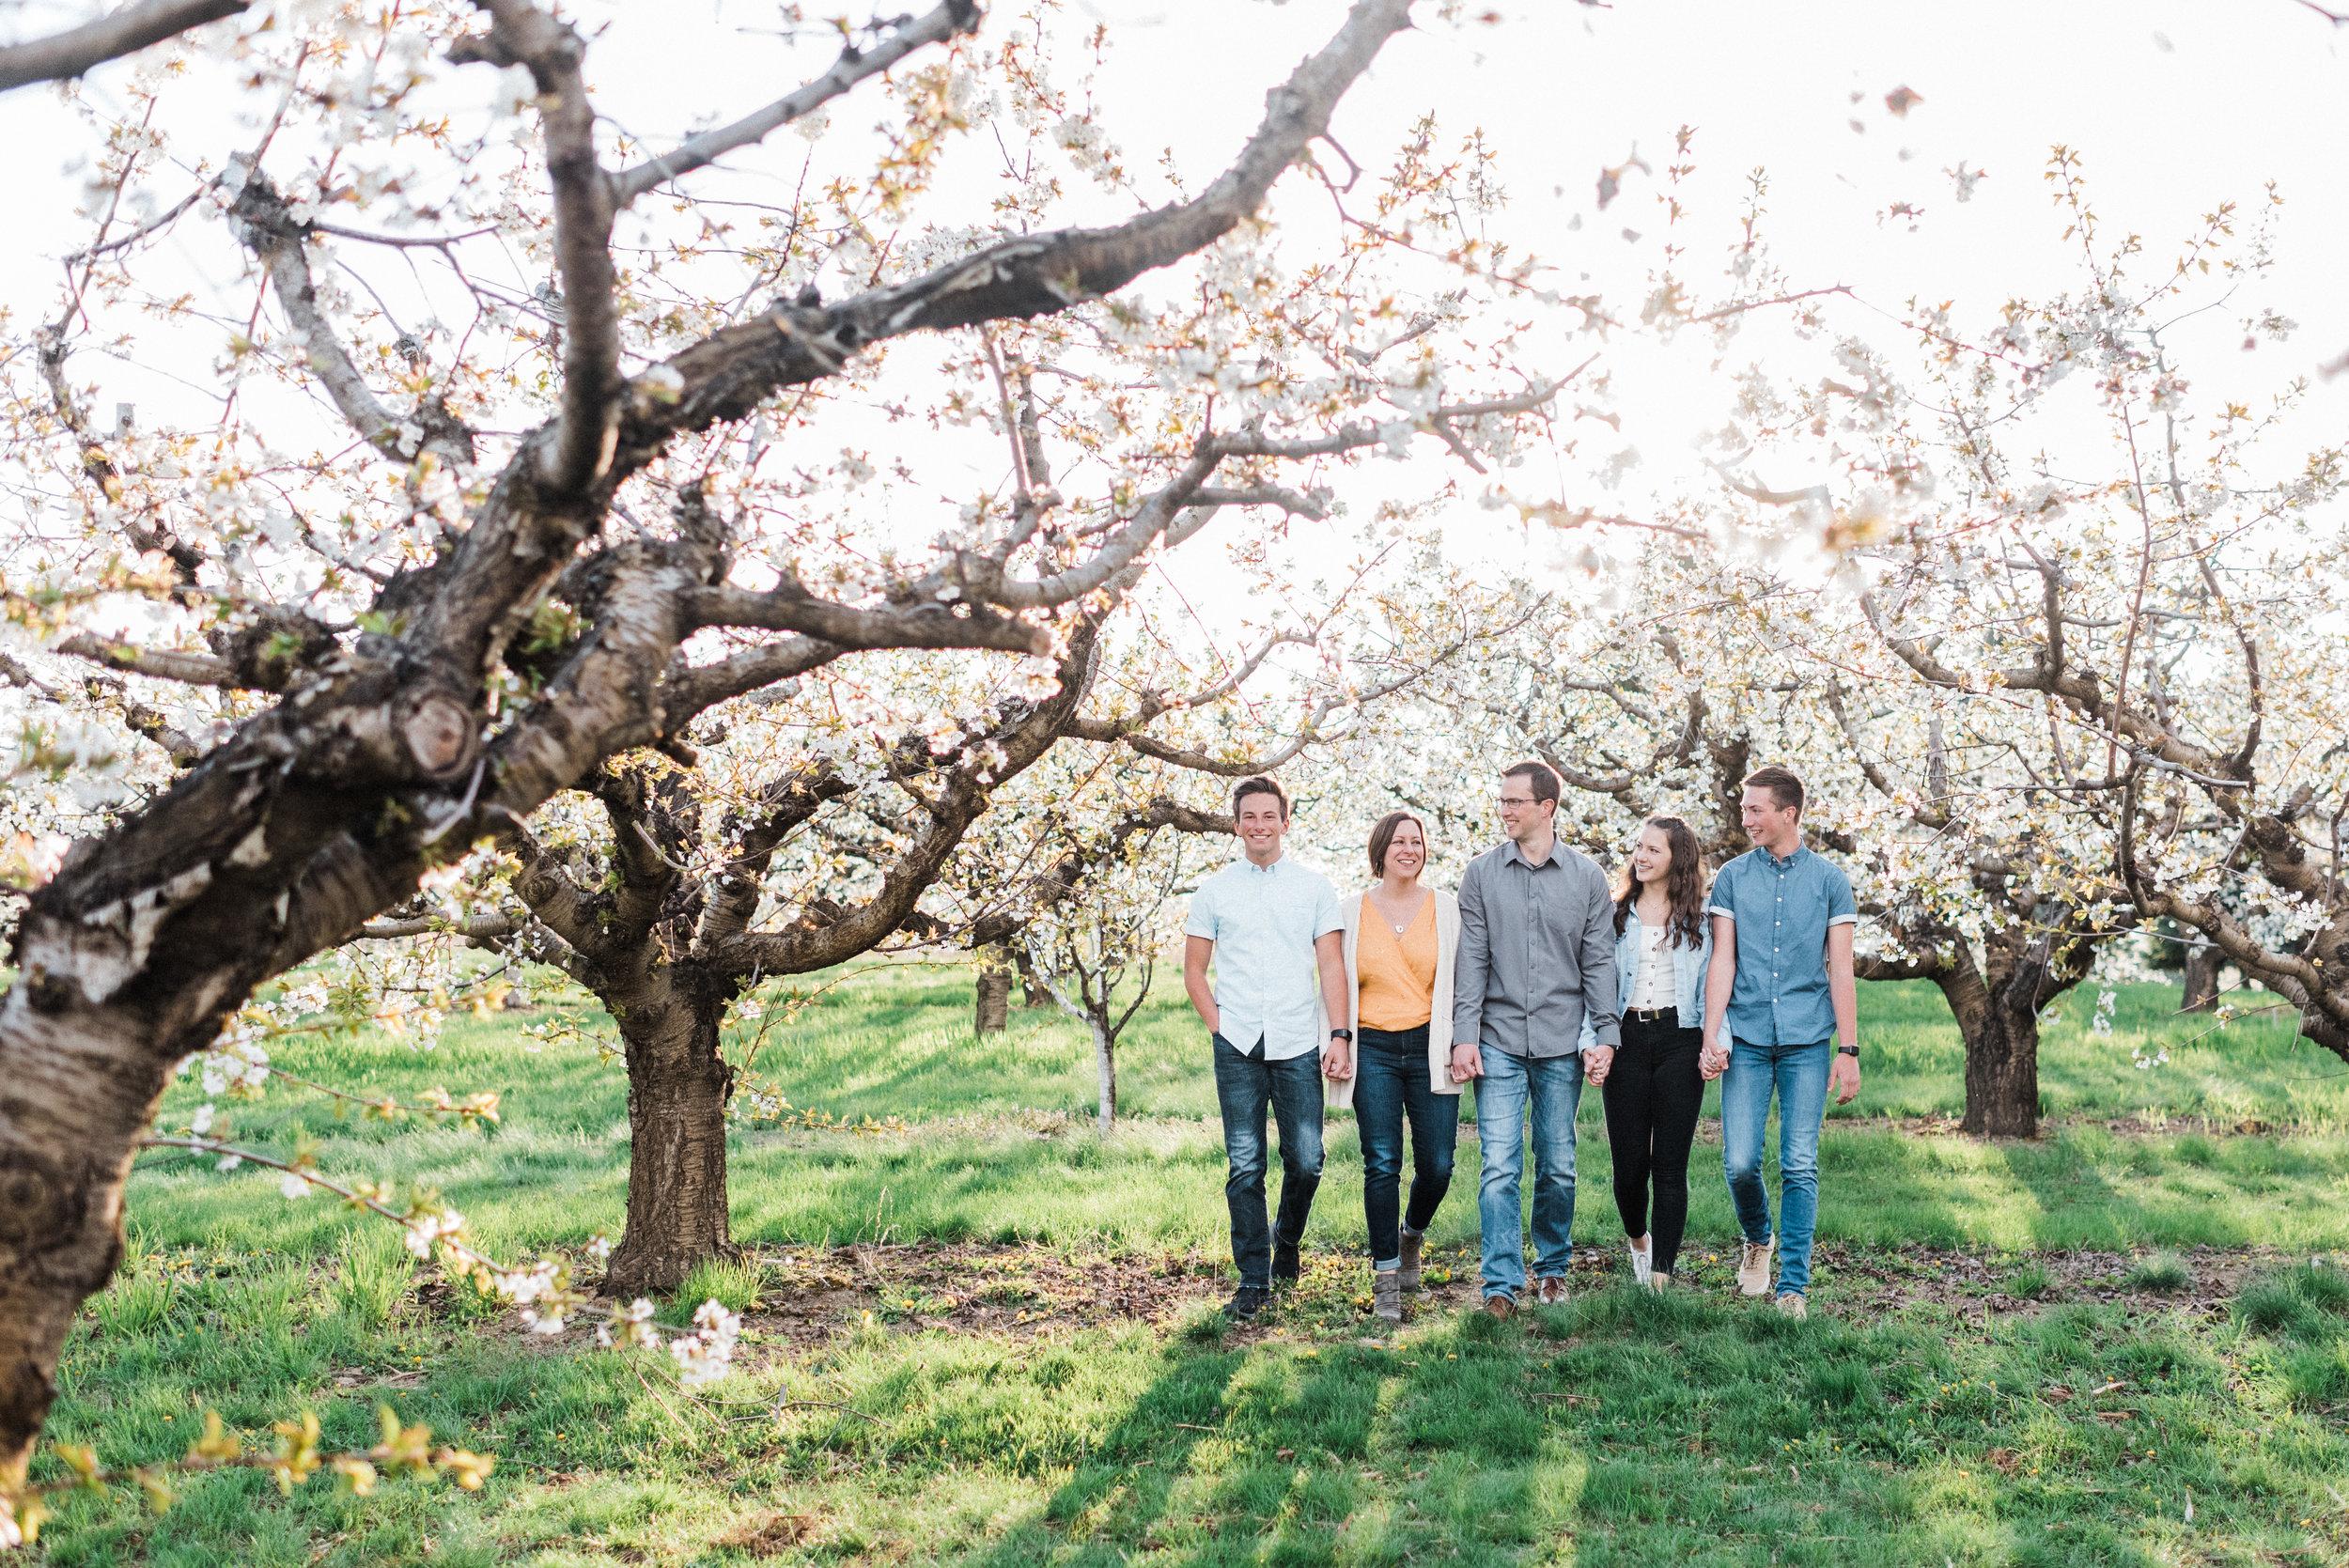 orchard_family_session_spokane_wa-8.jpg